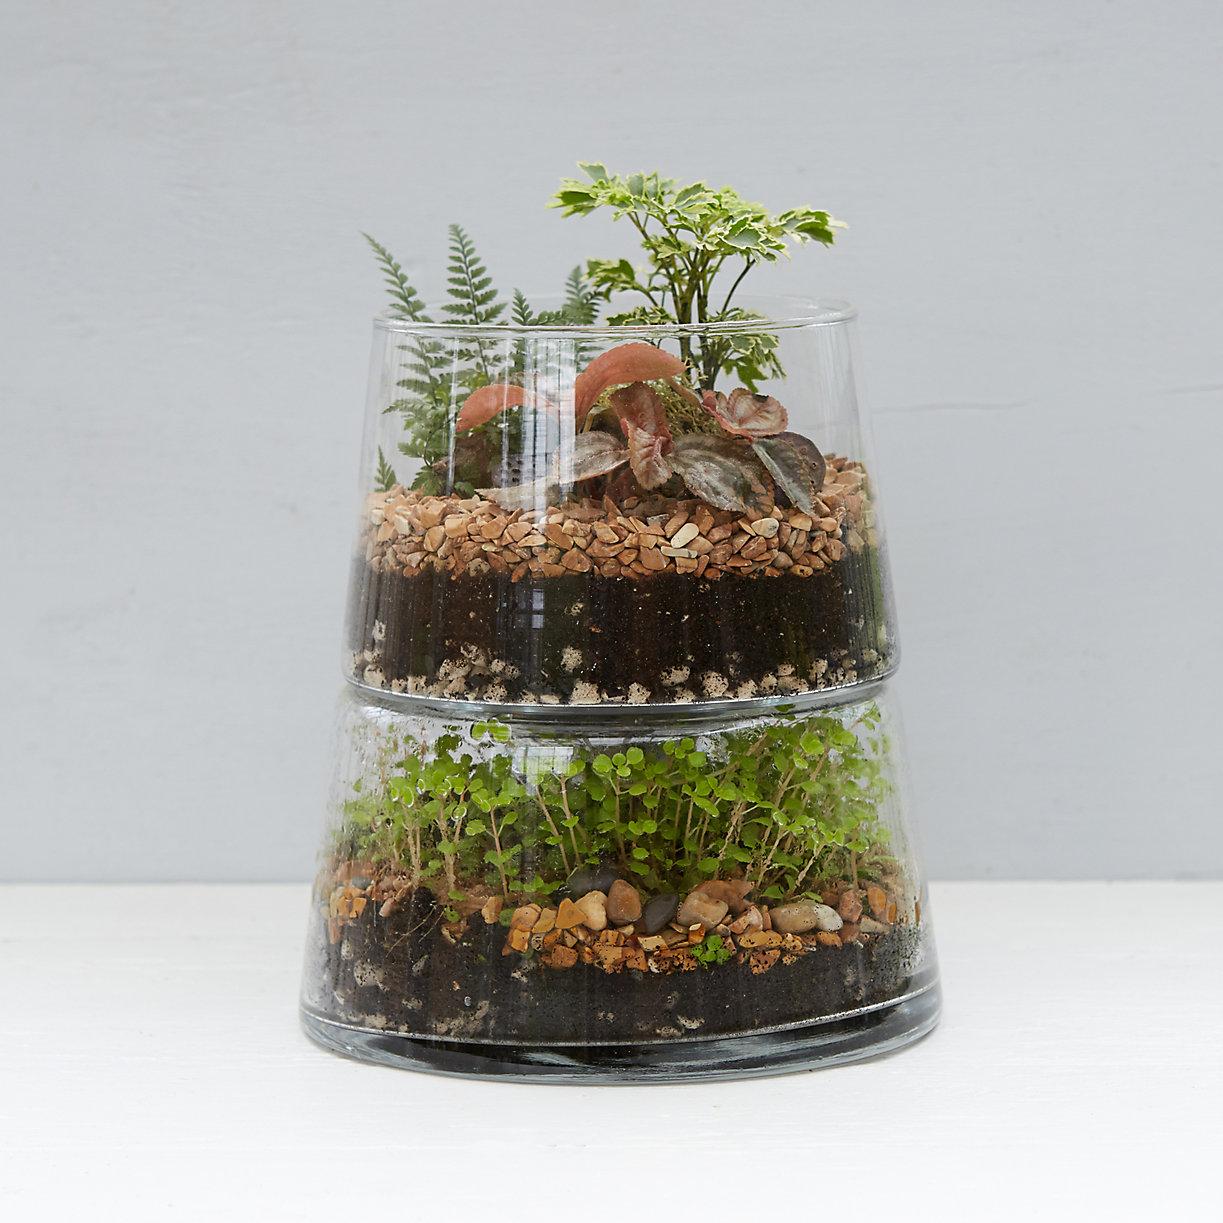 Double decker terrarium terrain for Terrarium supplies